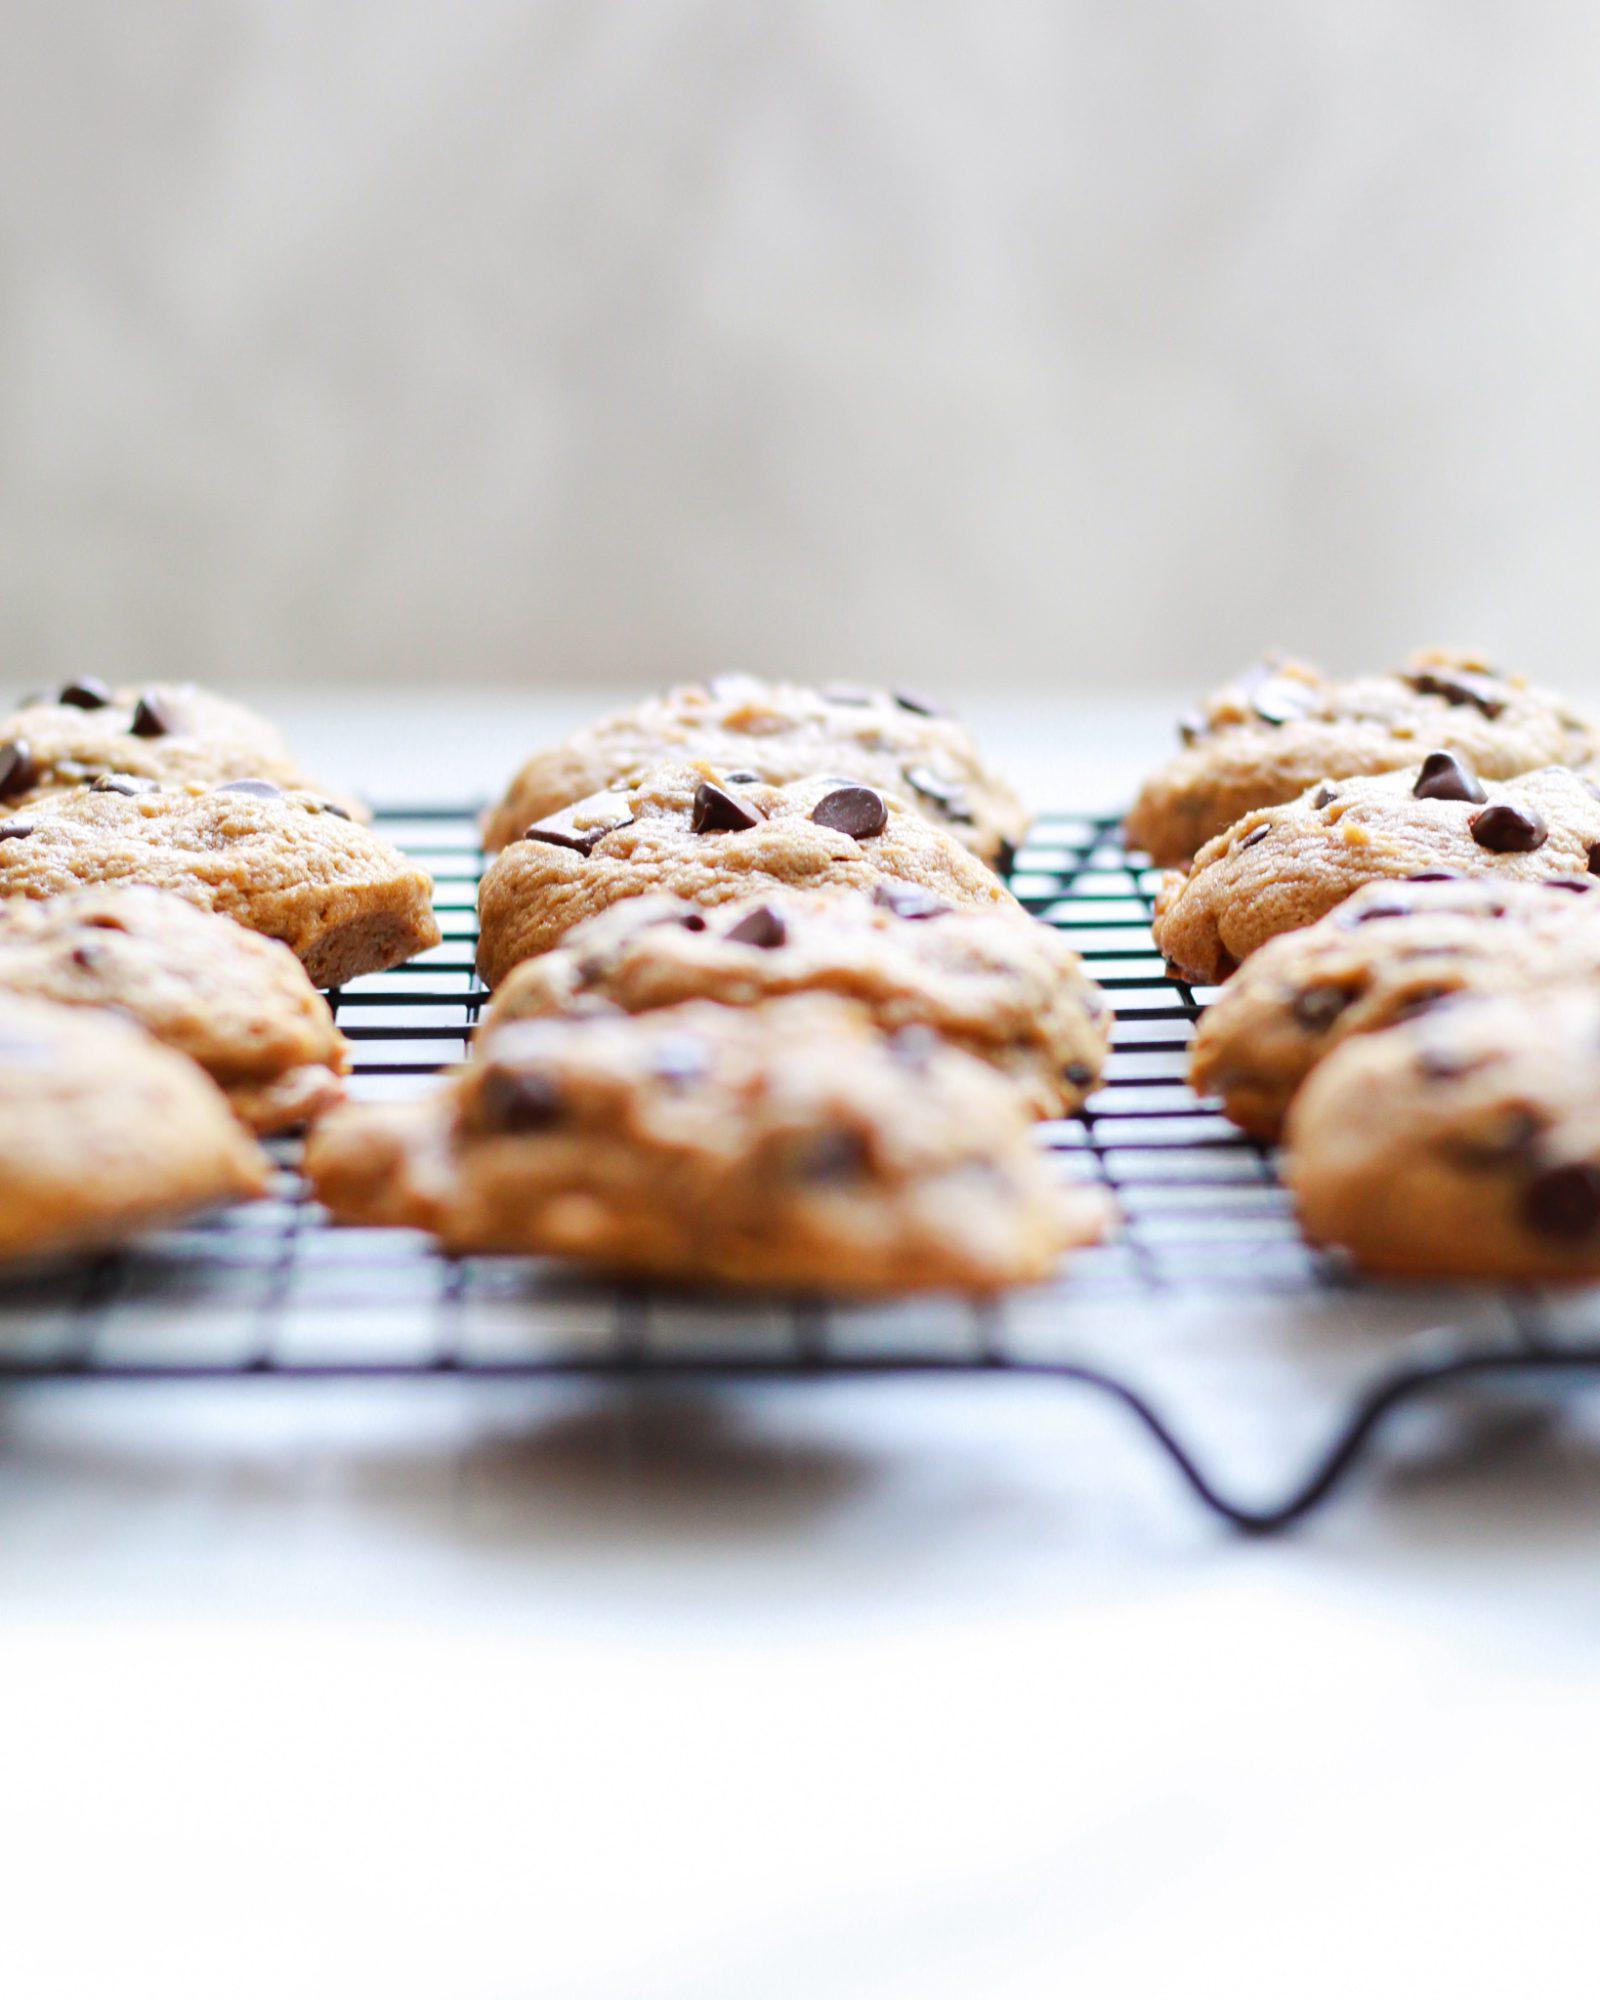 fresh baked vegan chocolate chip cookies on cooling rack